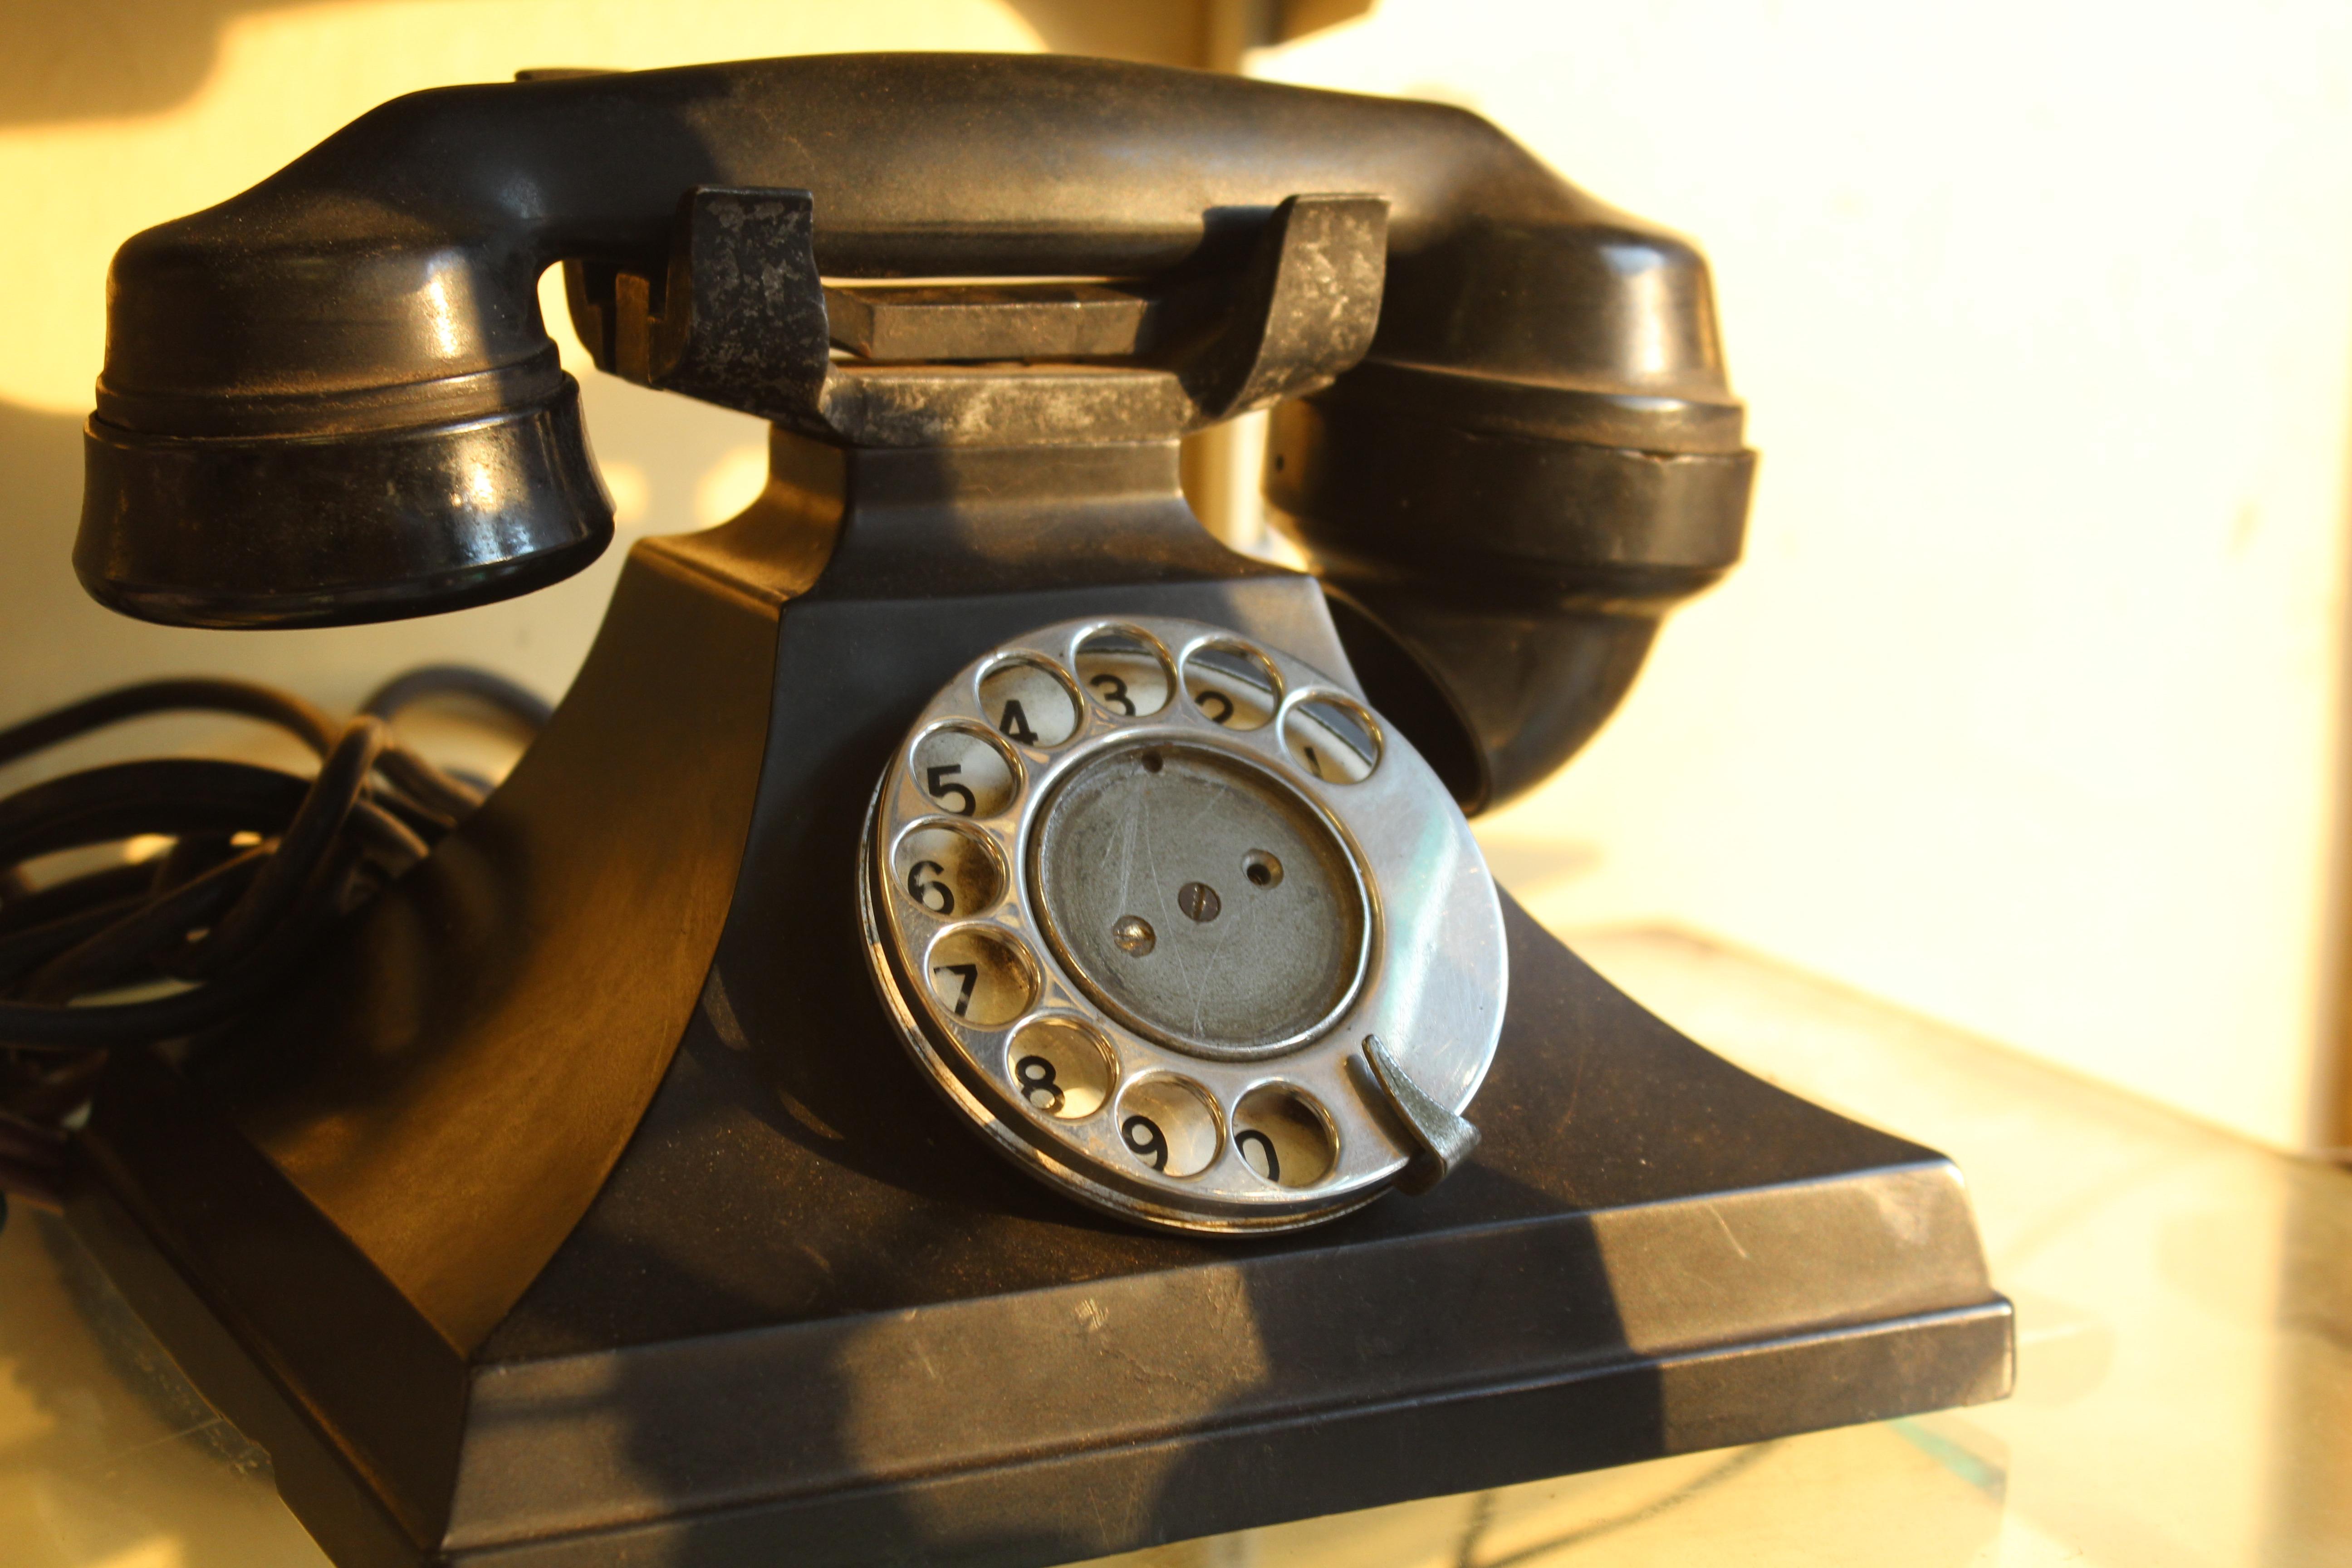 Free Images   Vintage  Antique  Retro  Old  Phone  Metal